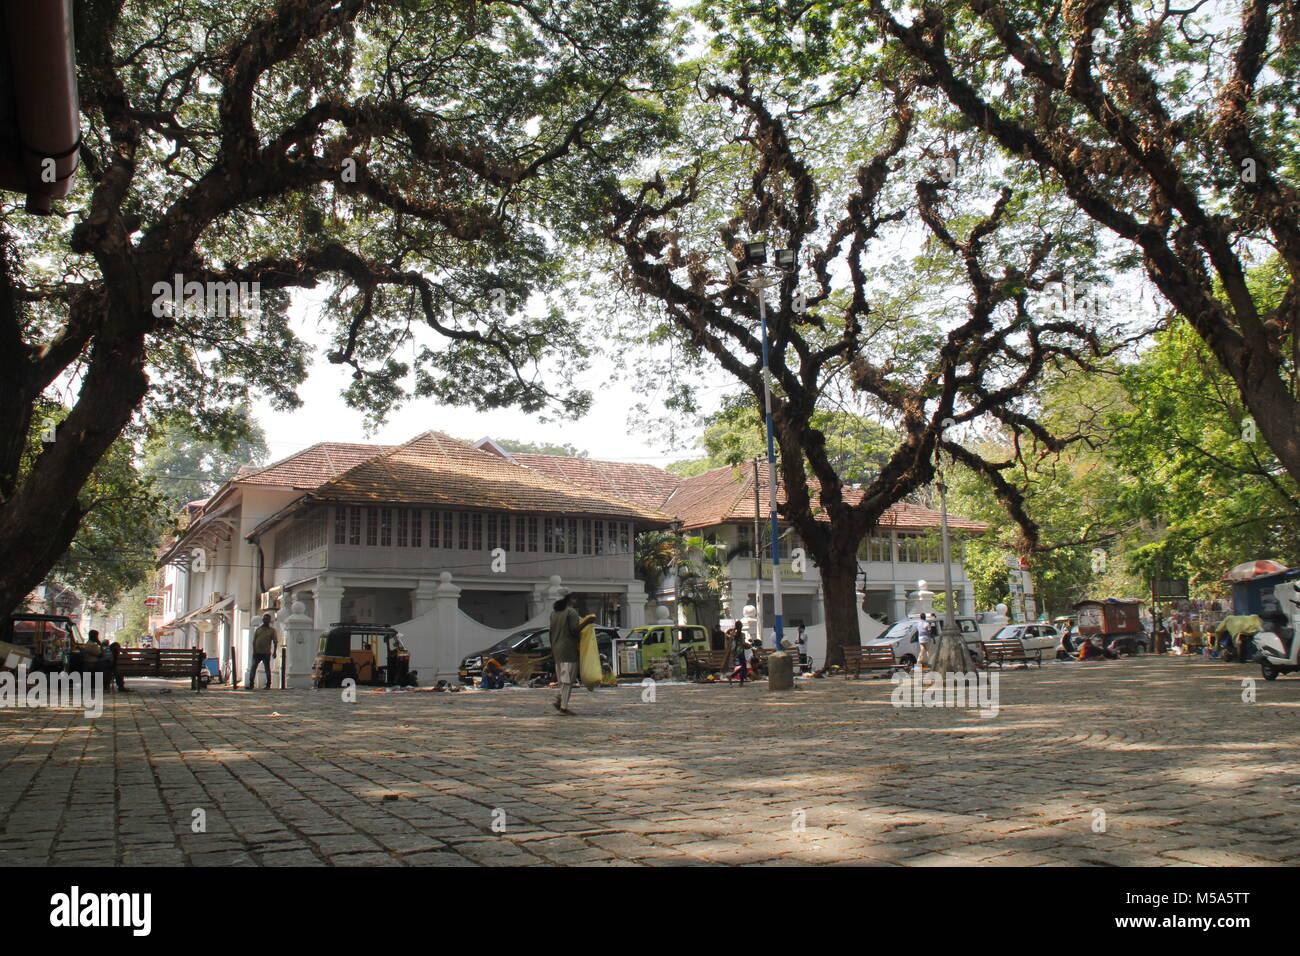 Streets of Fort Kochi, Kerala - Stock Image